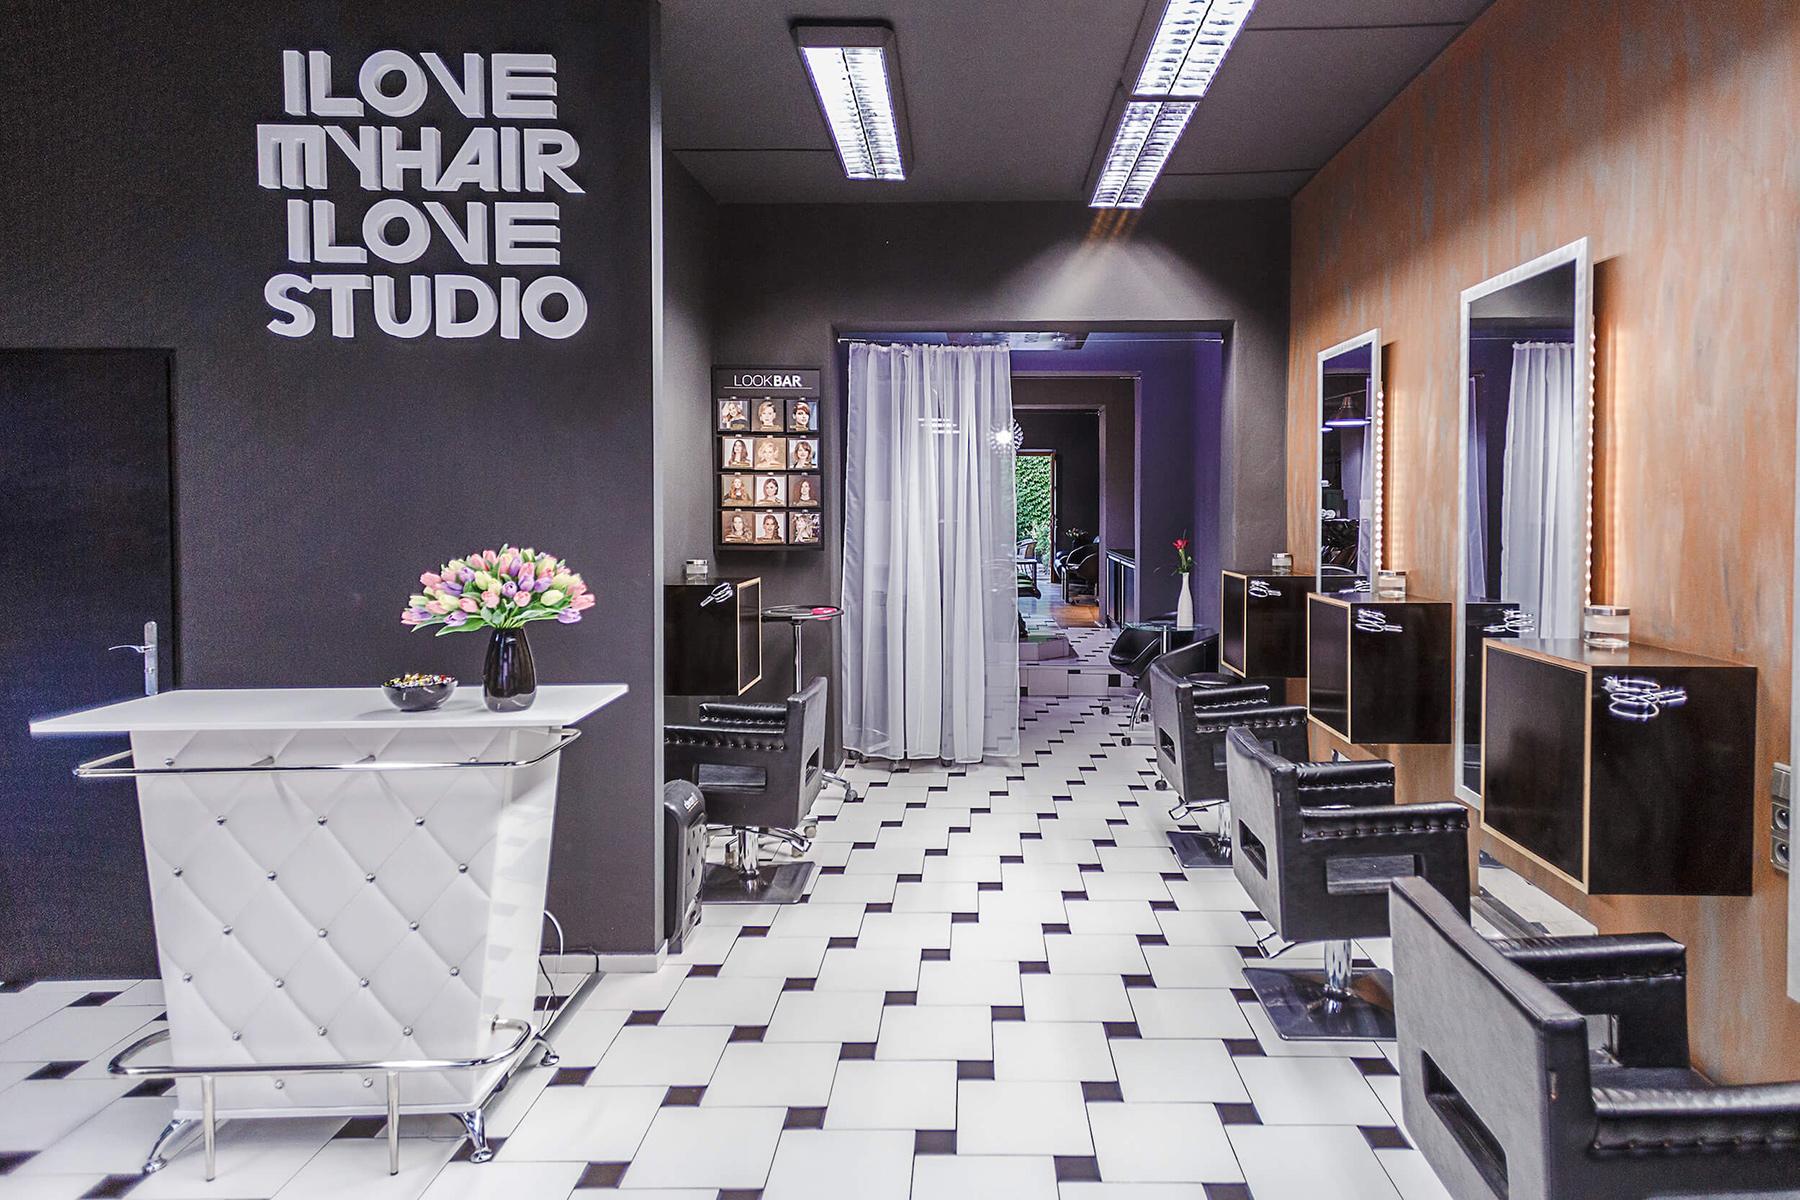 interiéry I LOVE MY HAIR STUDIO